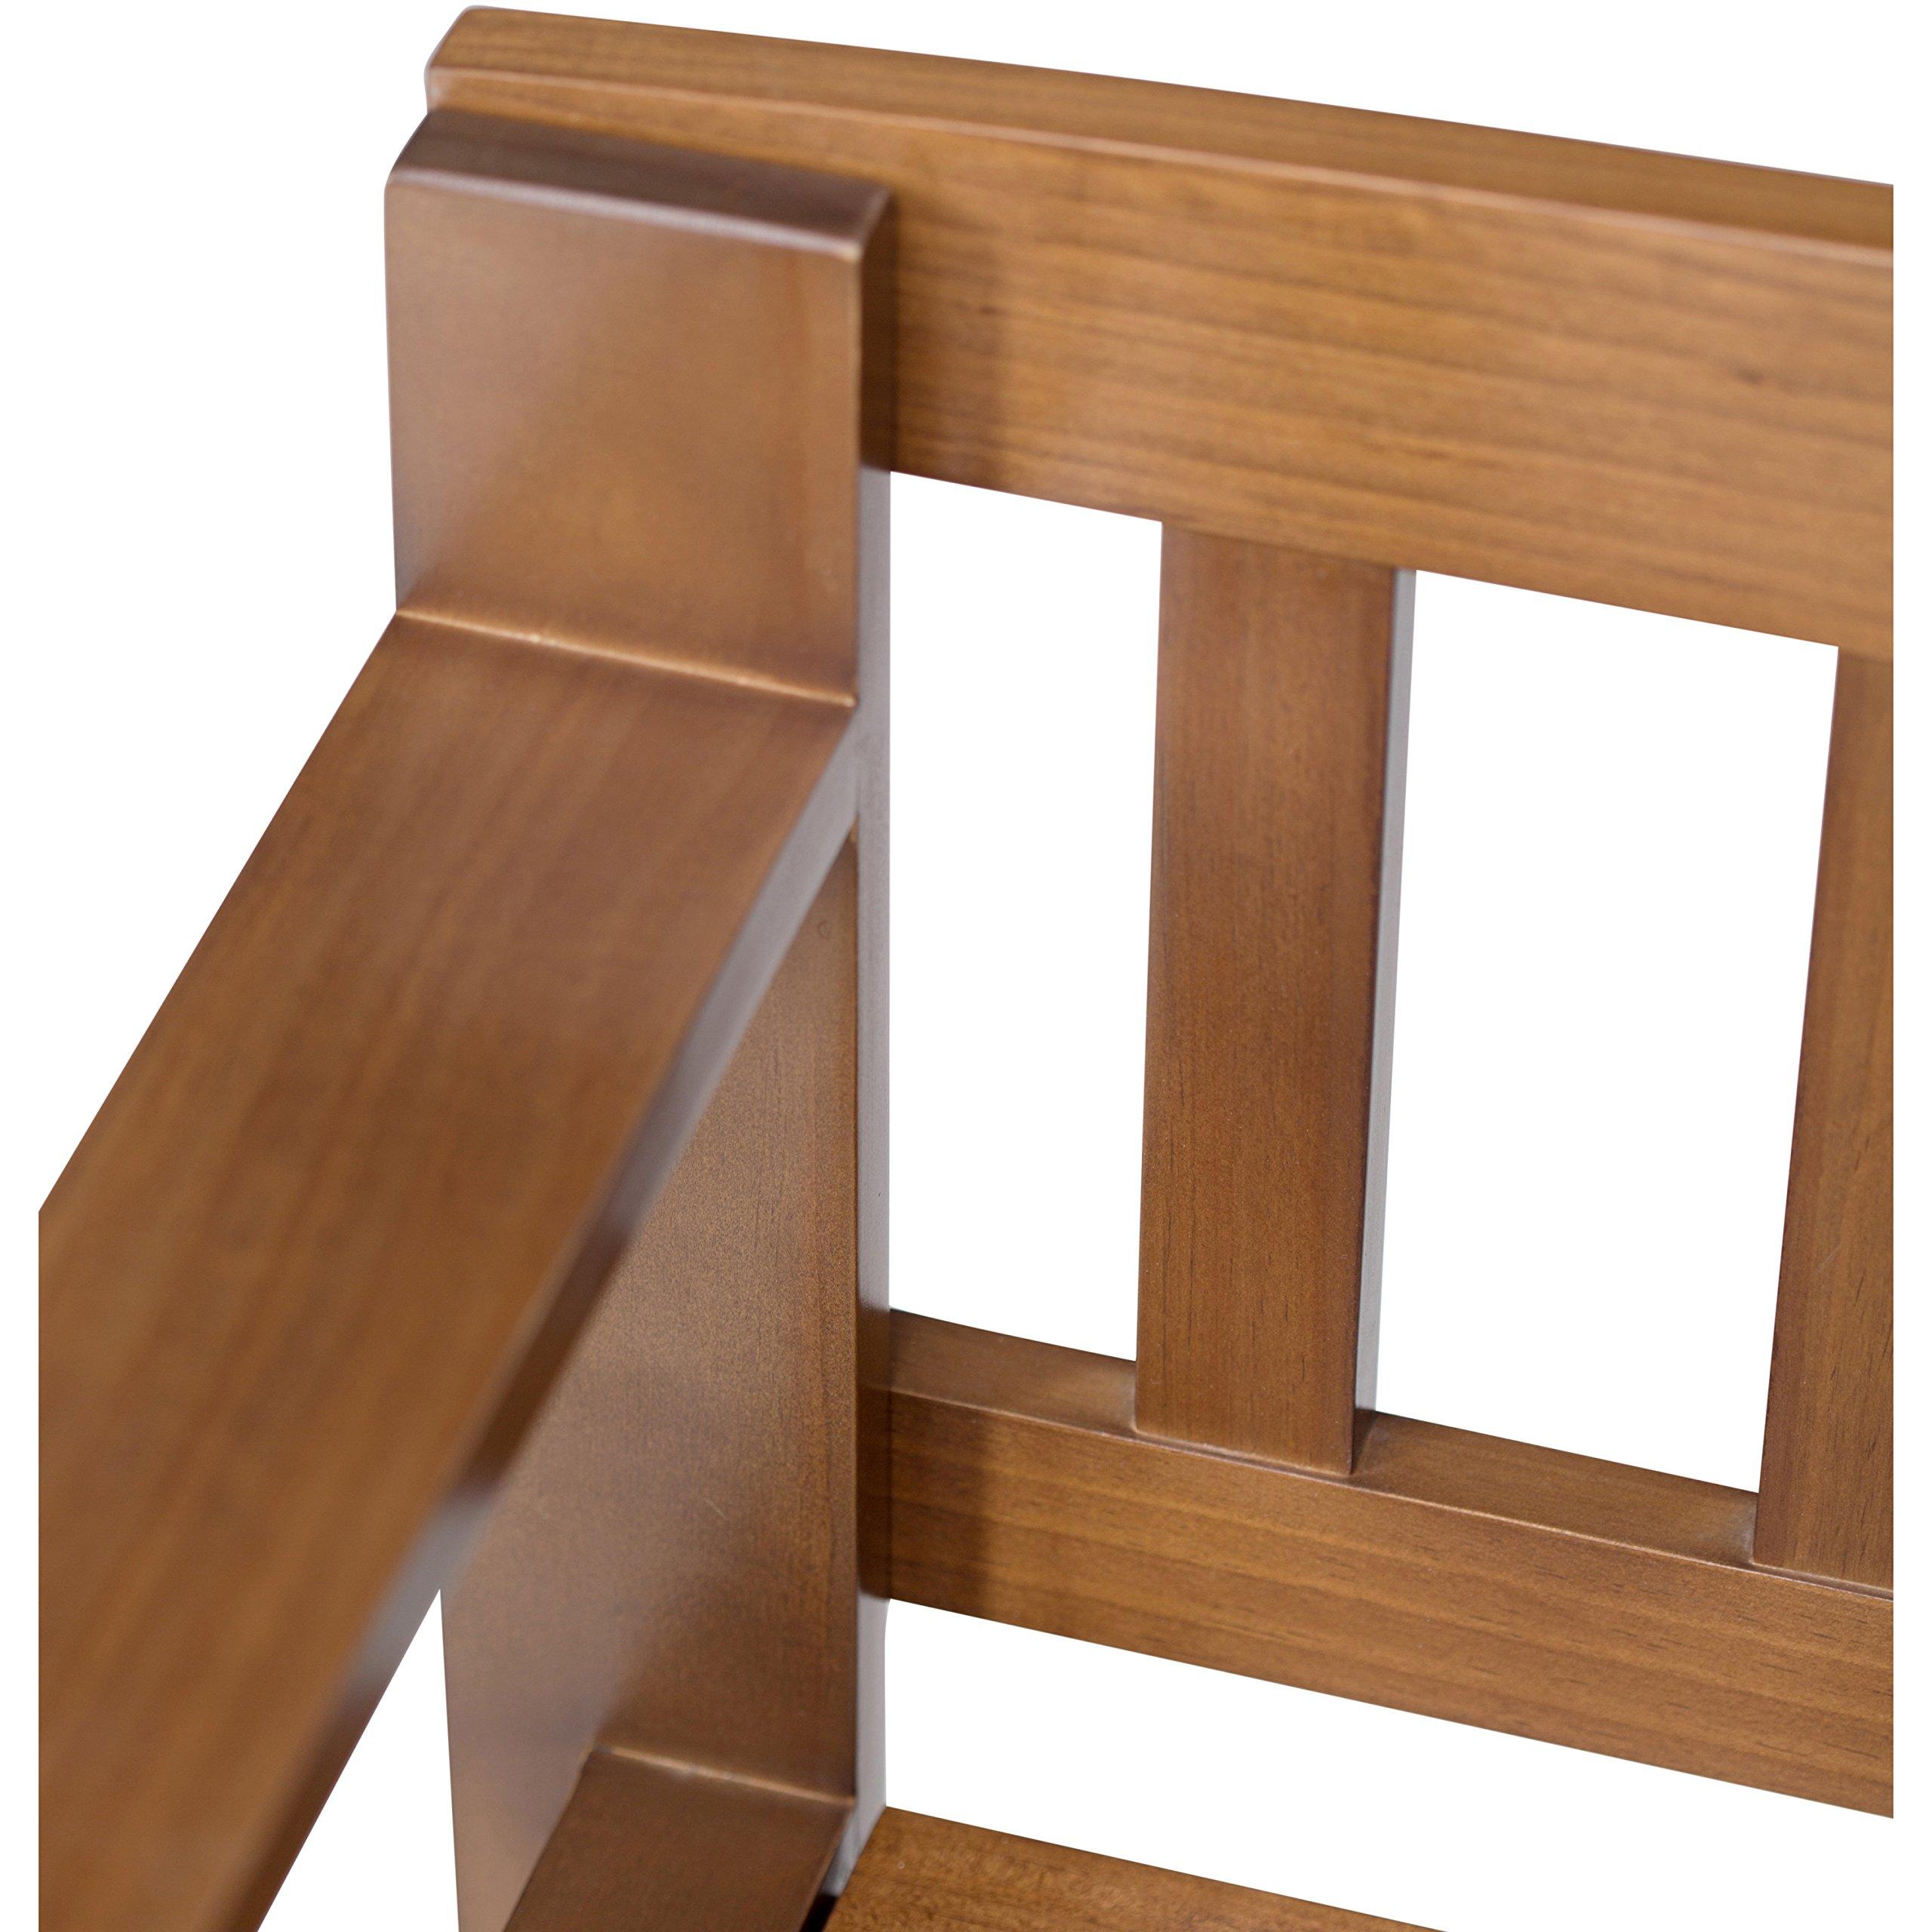 Simpli Home Brooklyn Solid Wood Entryway Storage Bench, Medium Saddle Brown by Simpli Home (Image #6)